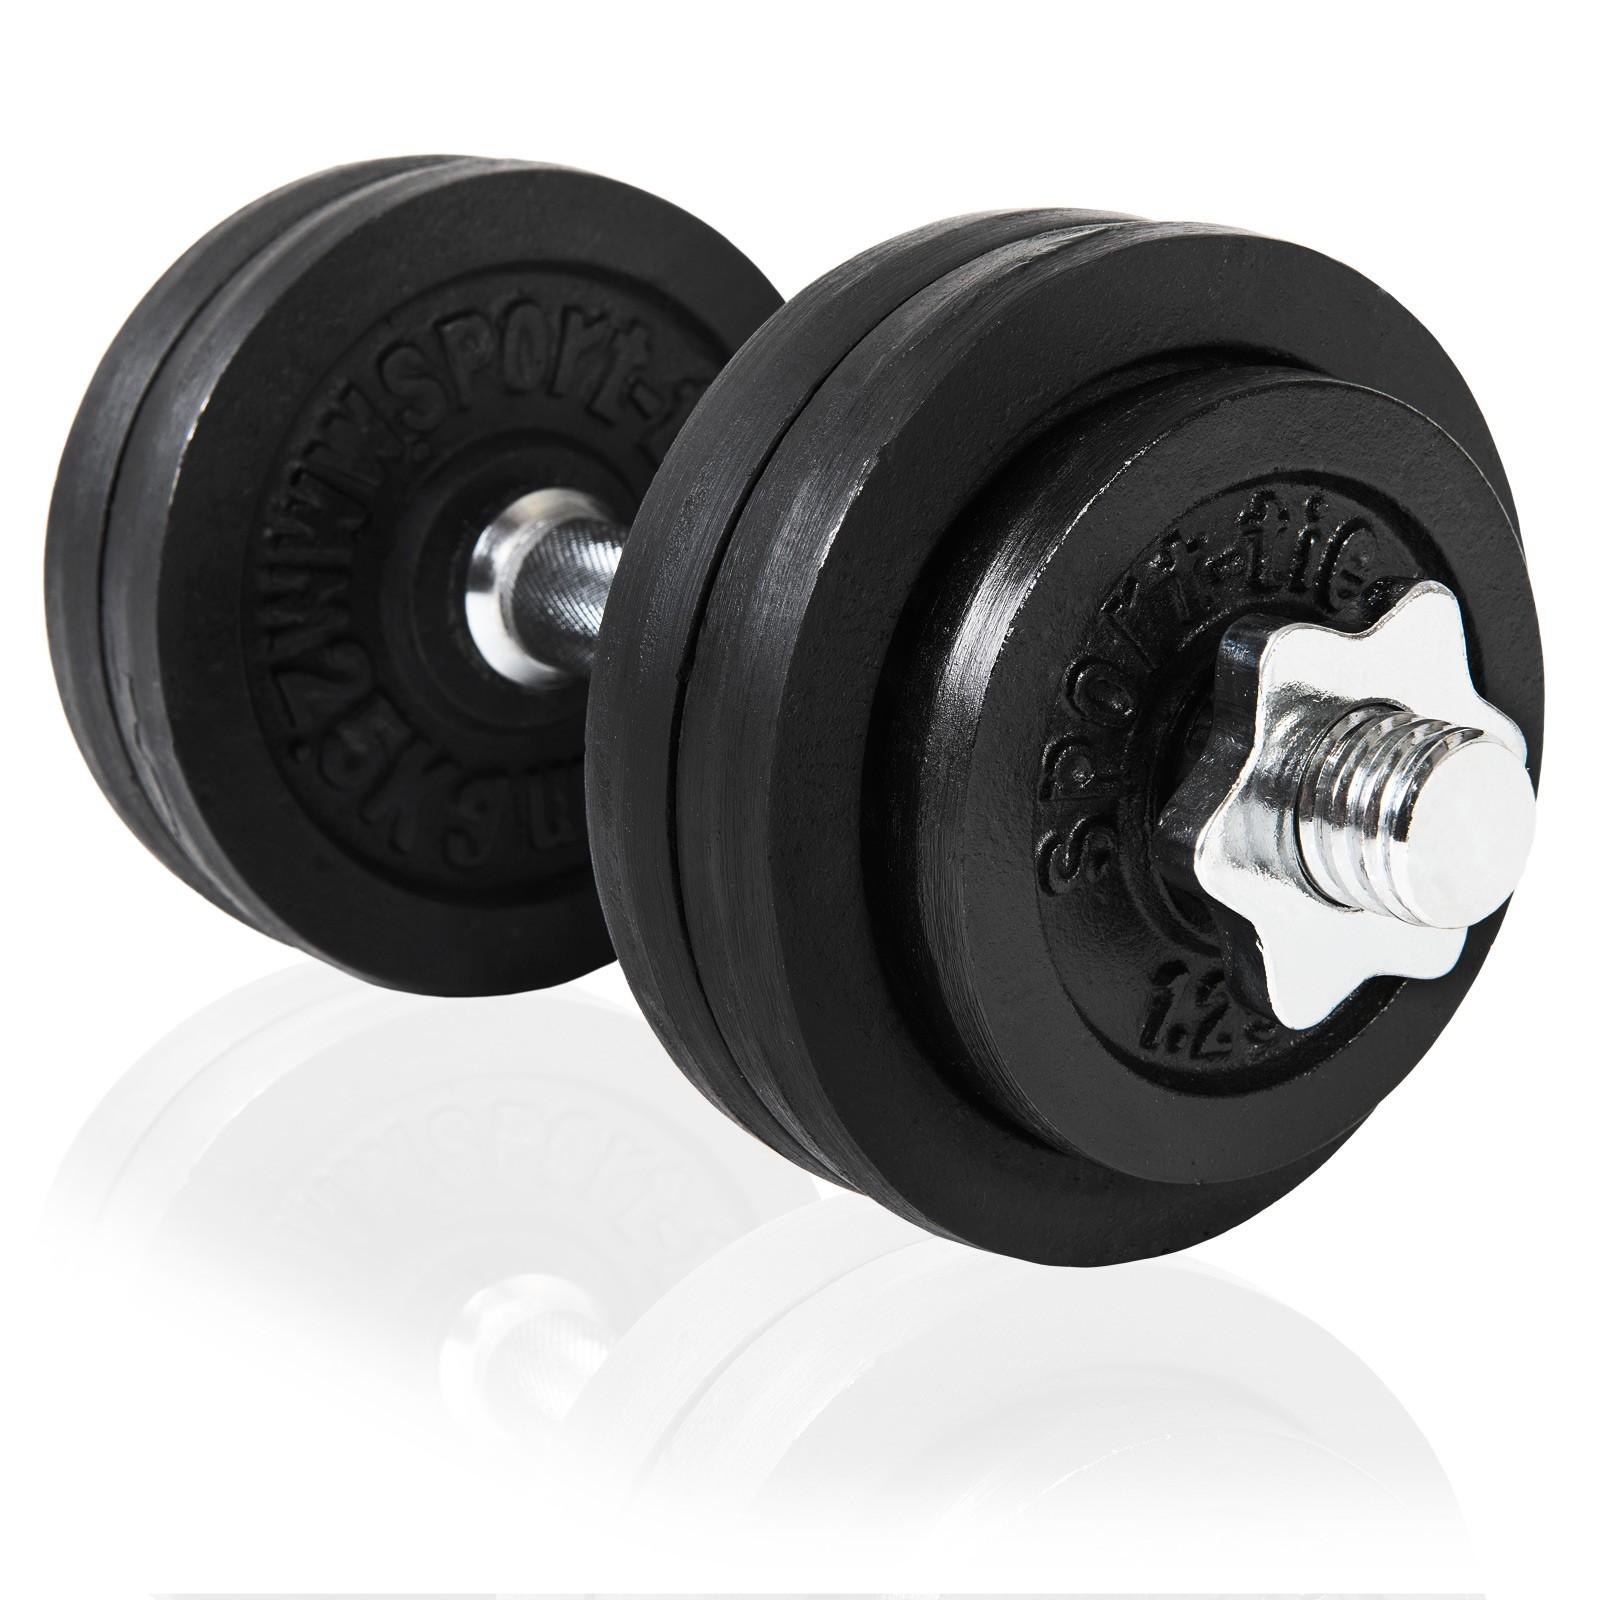 https://resources.t-fitness.com/bilder/sporttiedje/krafttraining/kurzhantelset-15kg/sport-tiedje-kurzhantel-15kg-001_1600.jpg